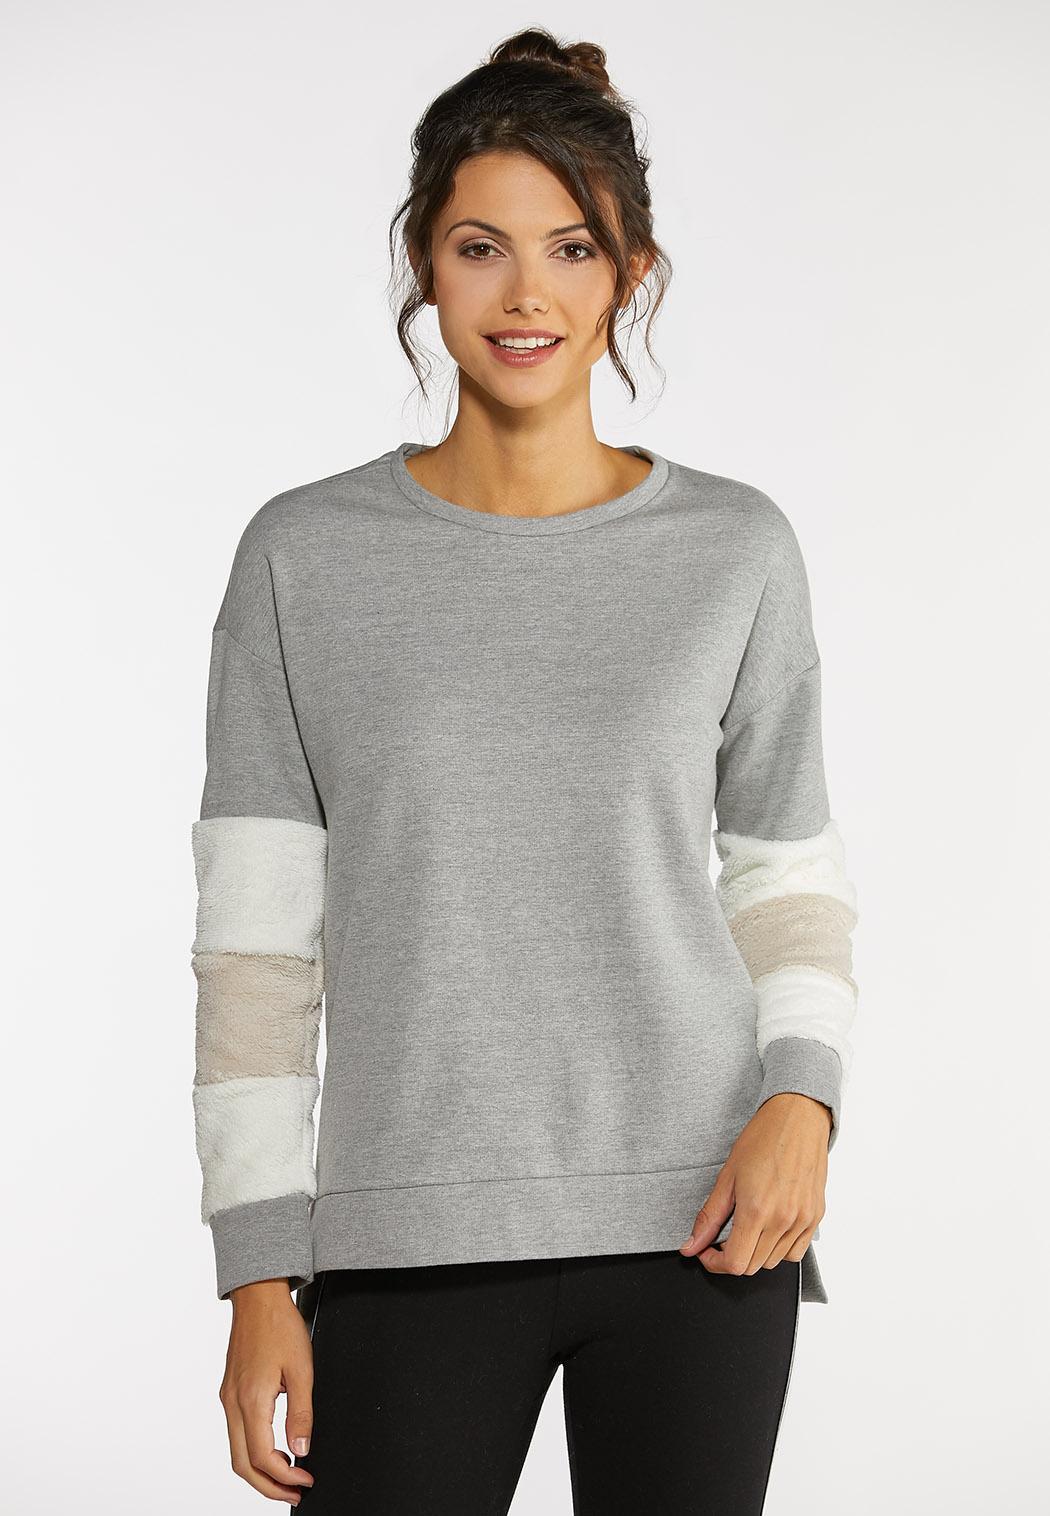 Plus Size Fur Cuff Sweatshirt